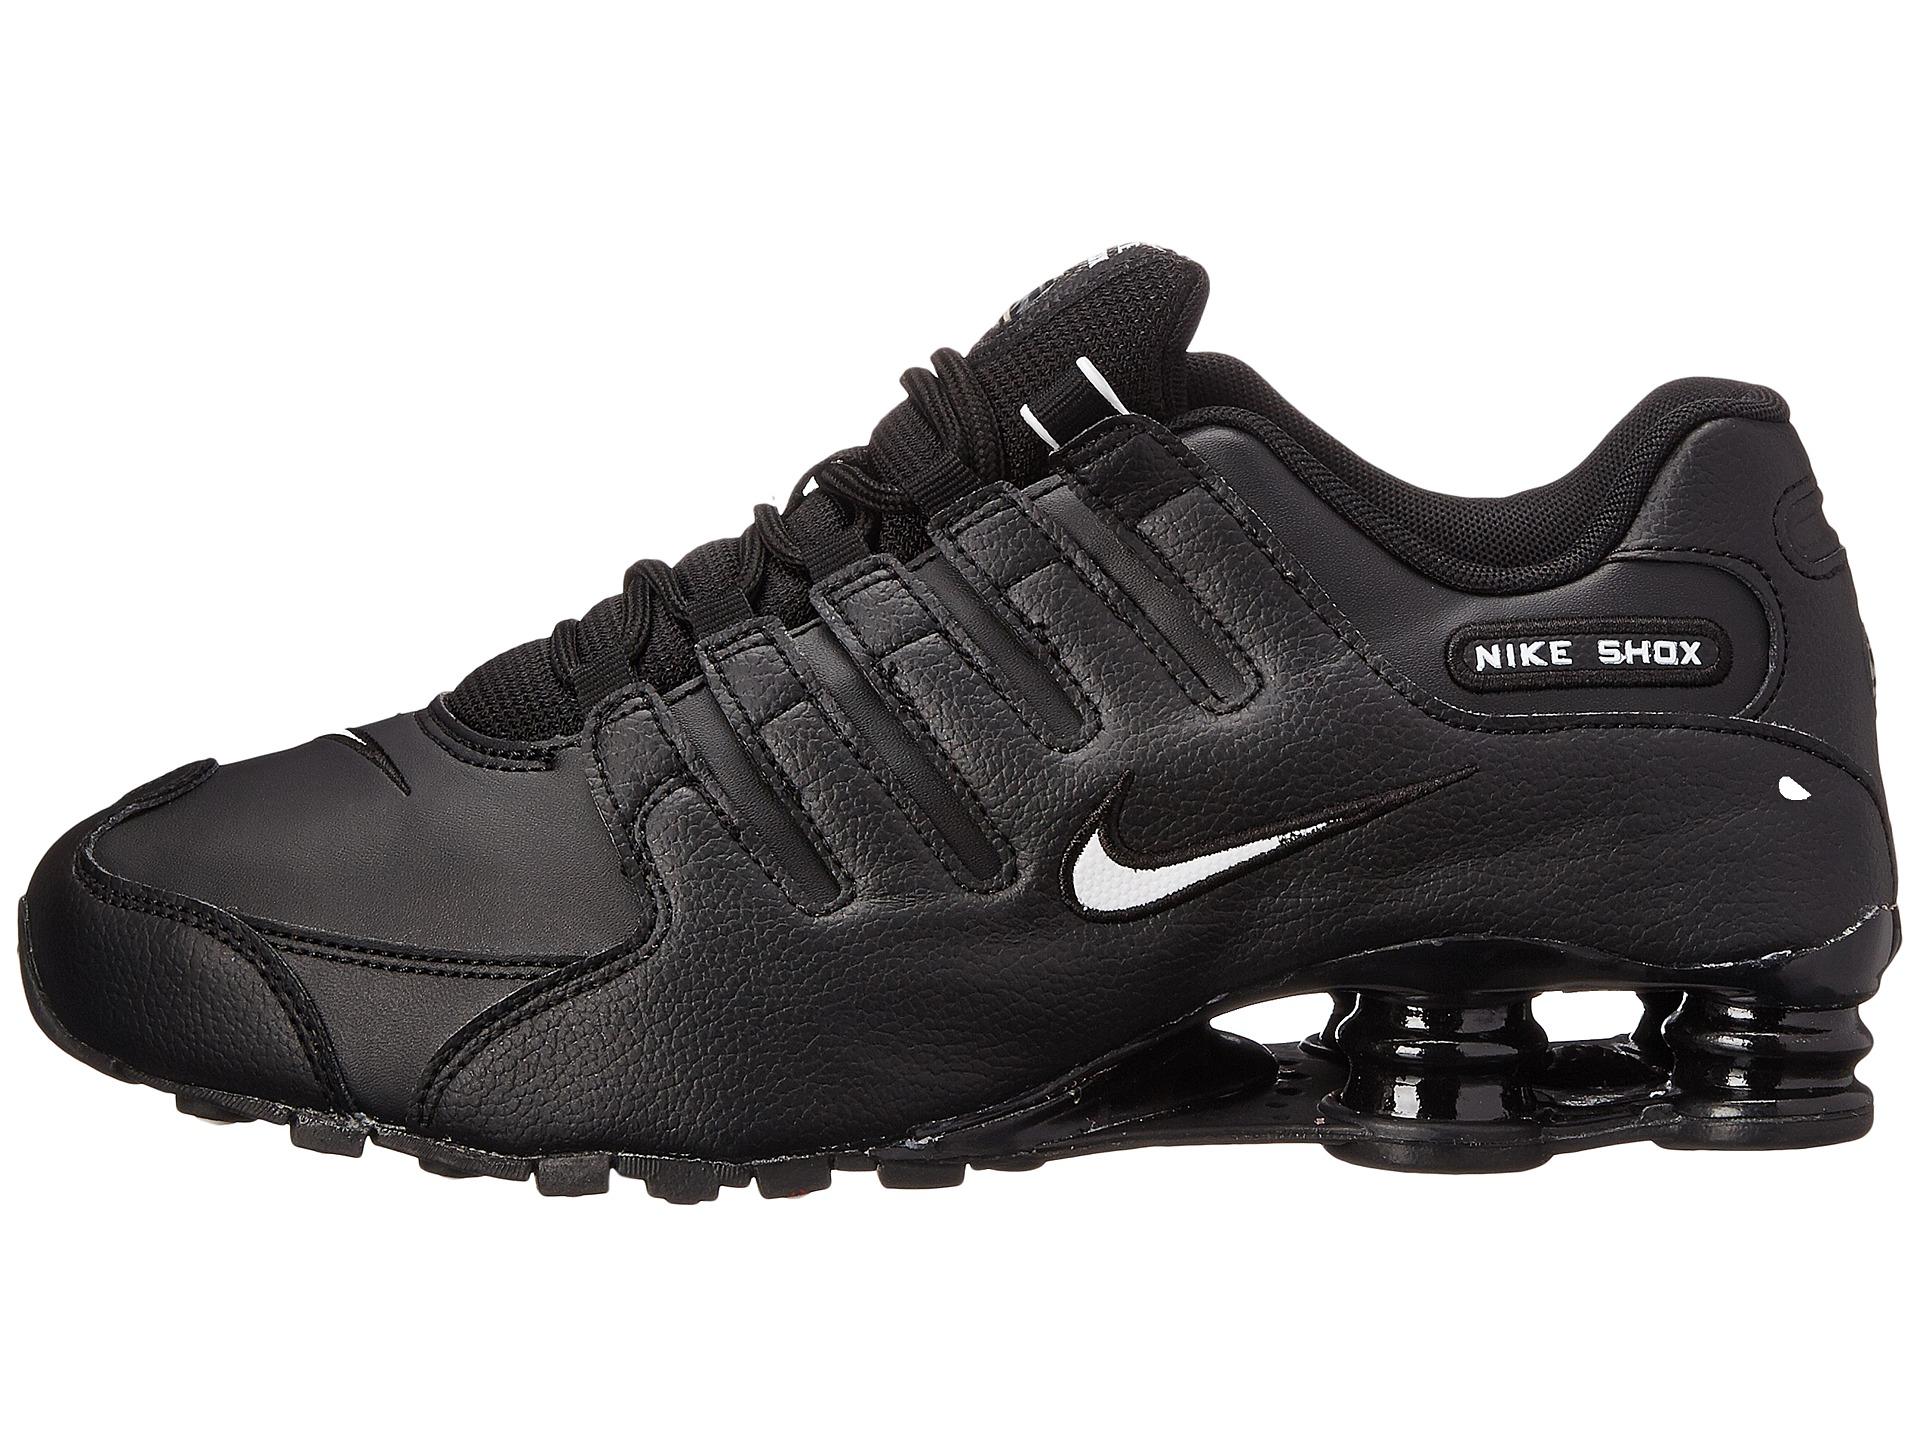 Boys Nike Shox Shoes